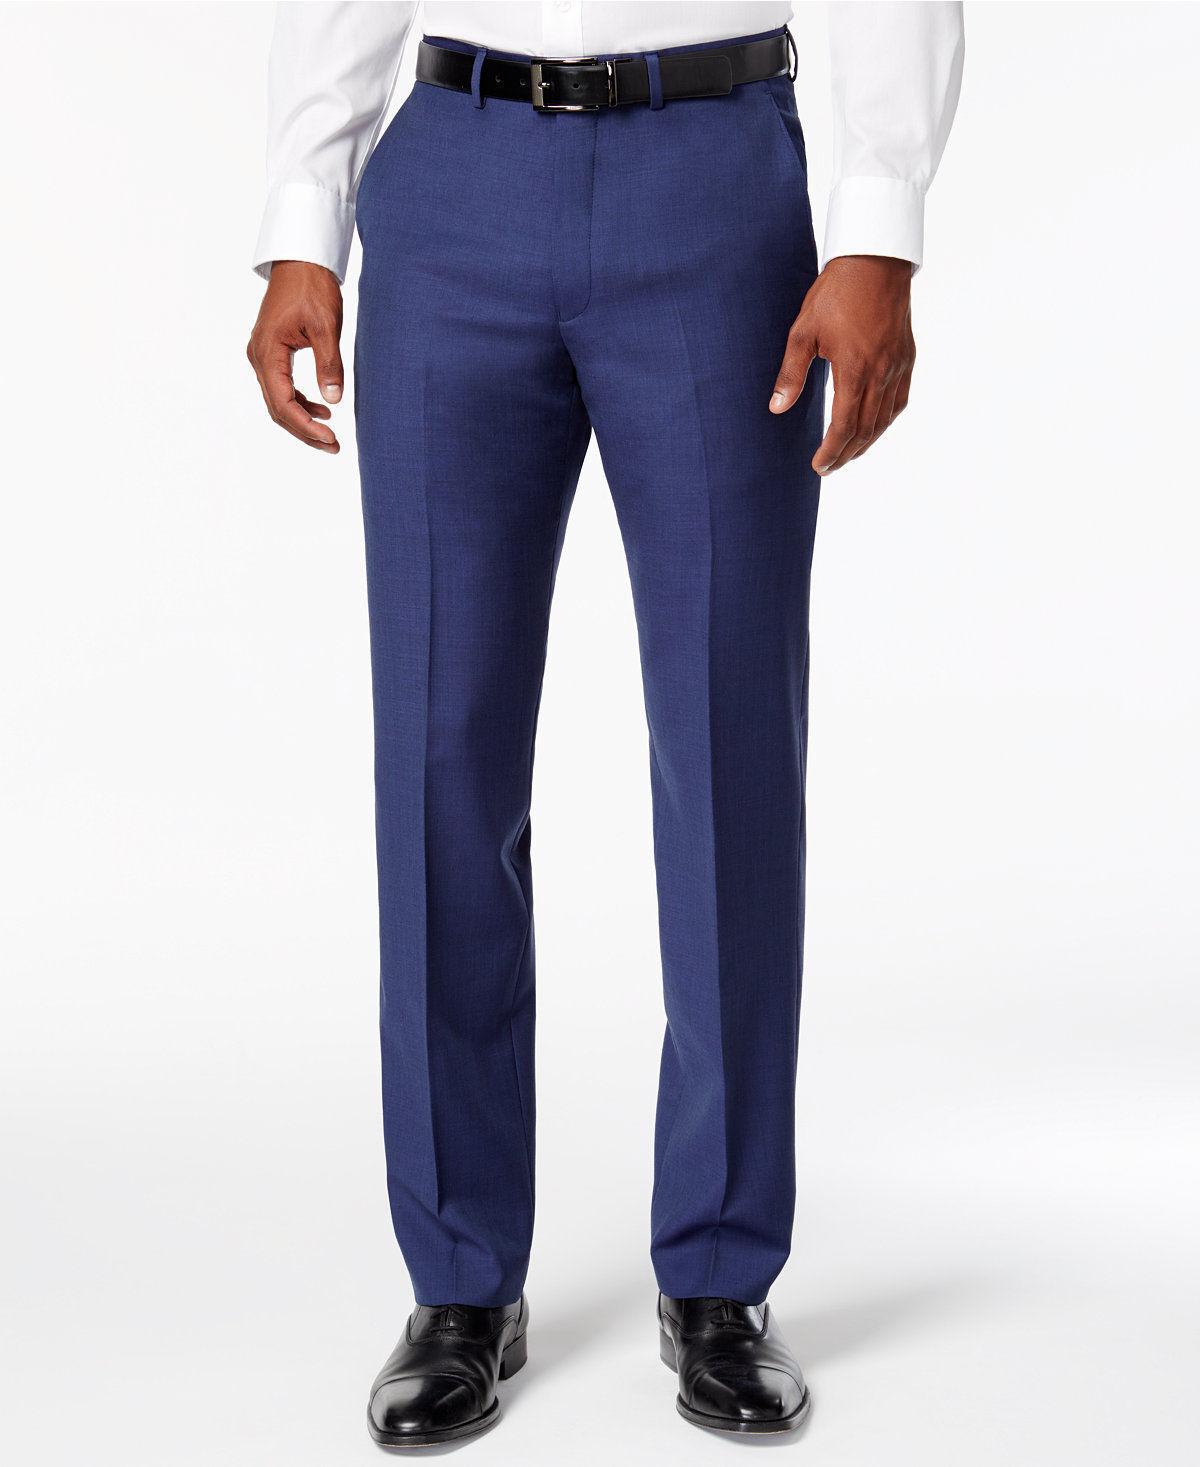 RYAN SEACREST men blueE SLIM FIT SUIT WOOL DRESS TROUSERS PANTS SIZE 32W 30L